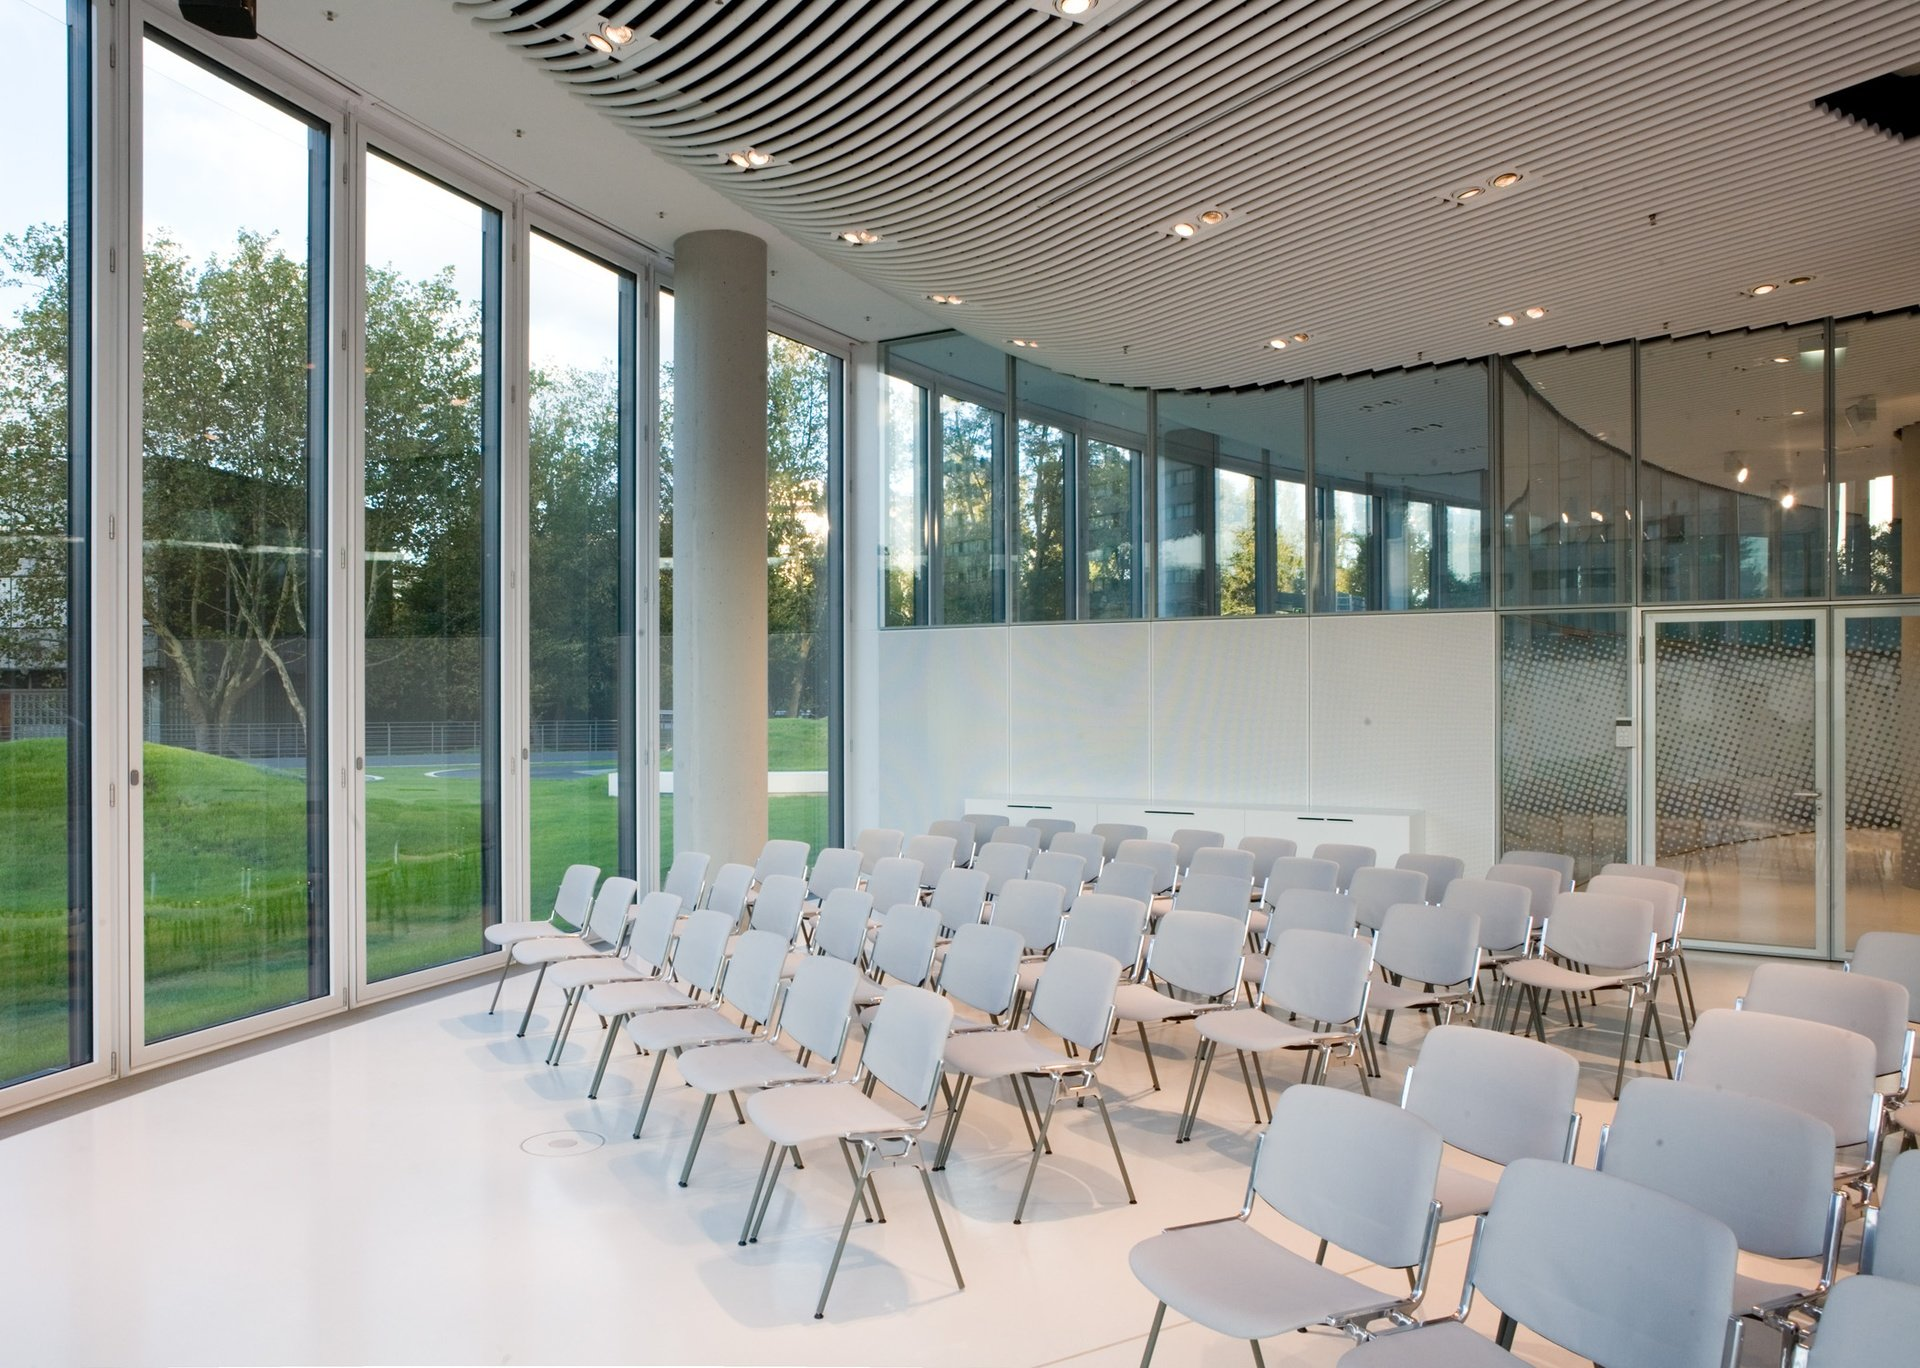 Düsseldorf seminar rooms Auditorium Sky Office Düsseldorf - Unser Auditorium image 0